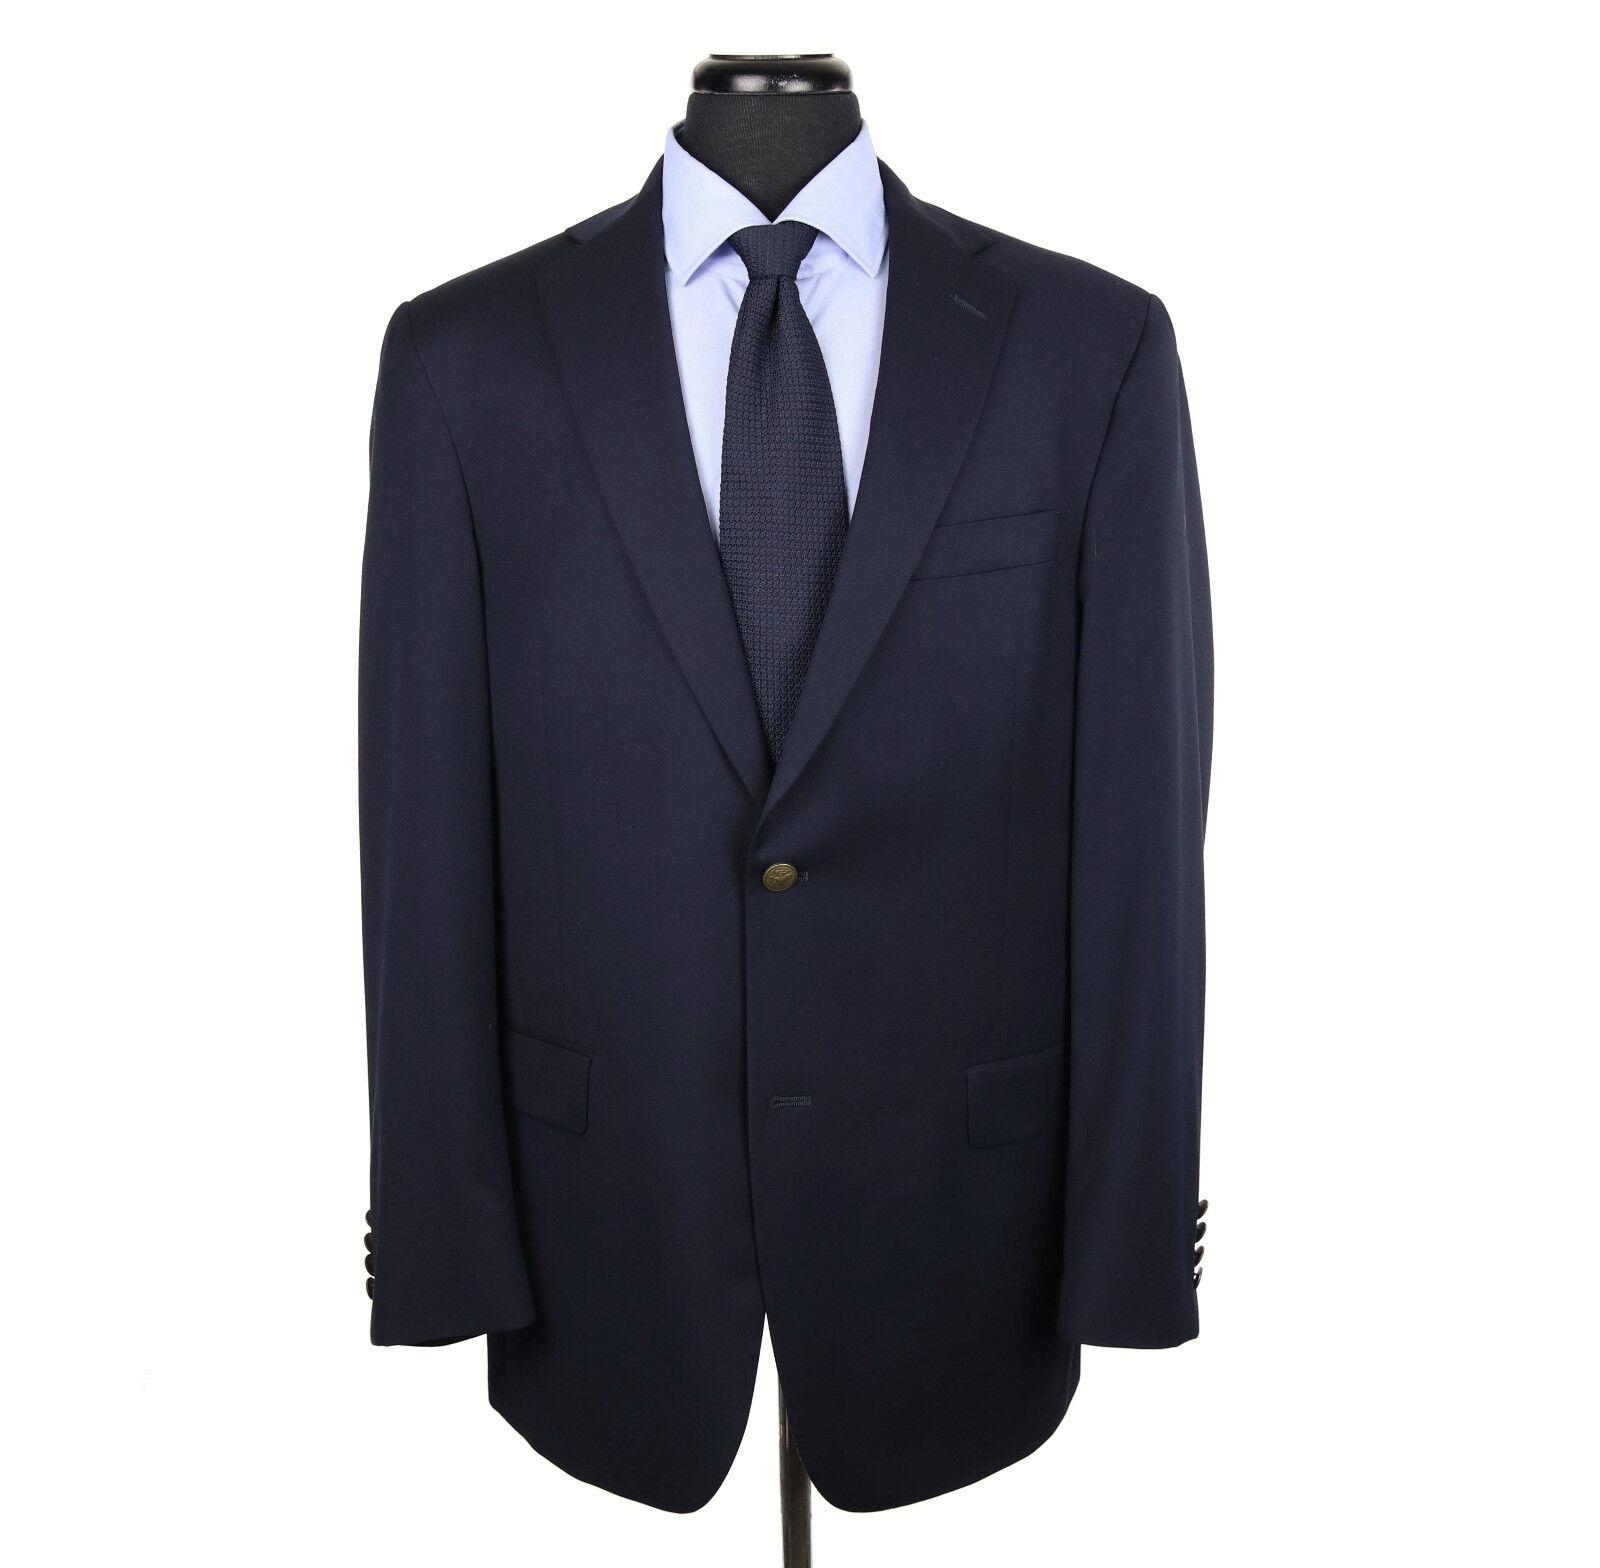 Hart Schaffner Marx 2-Btn Blazer Size 42L Navy bluee w Metal Buttons Very Recent